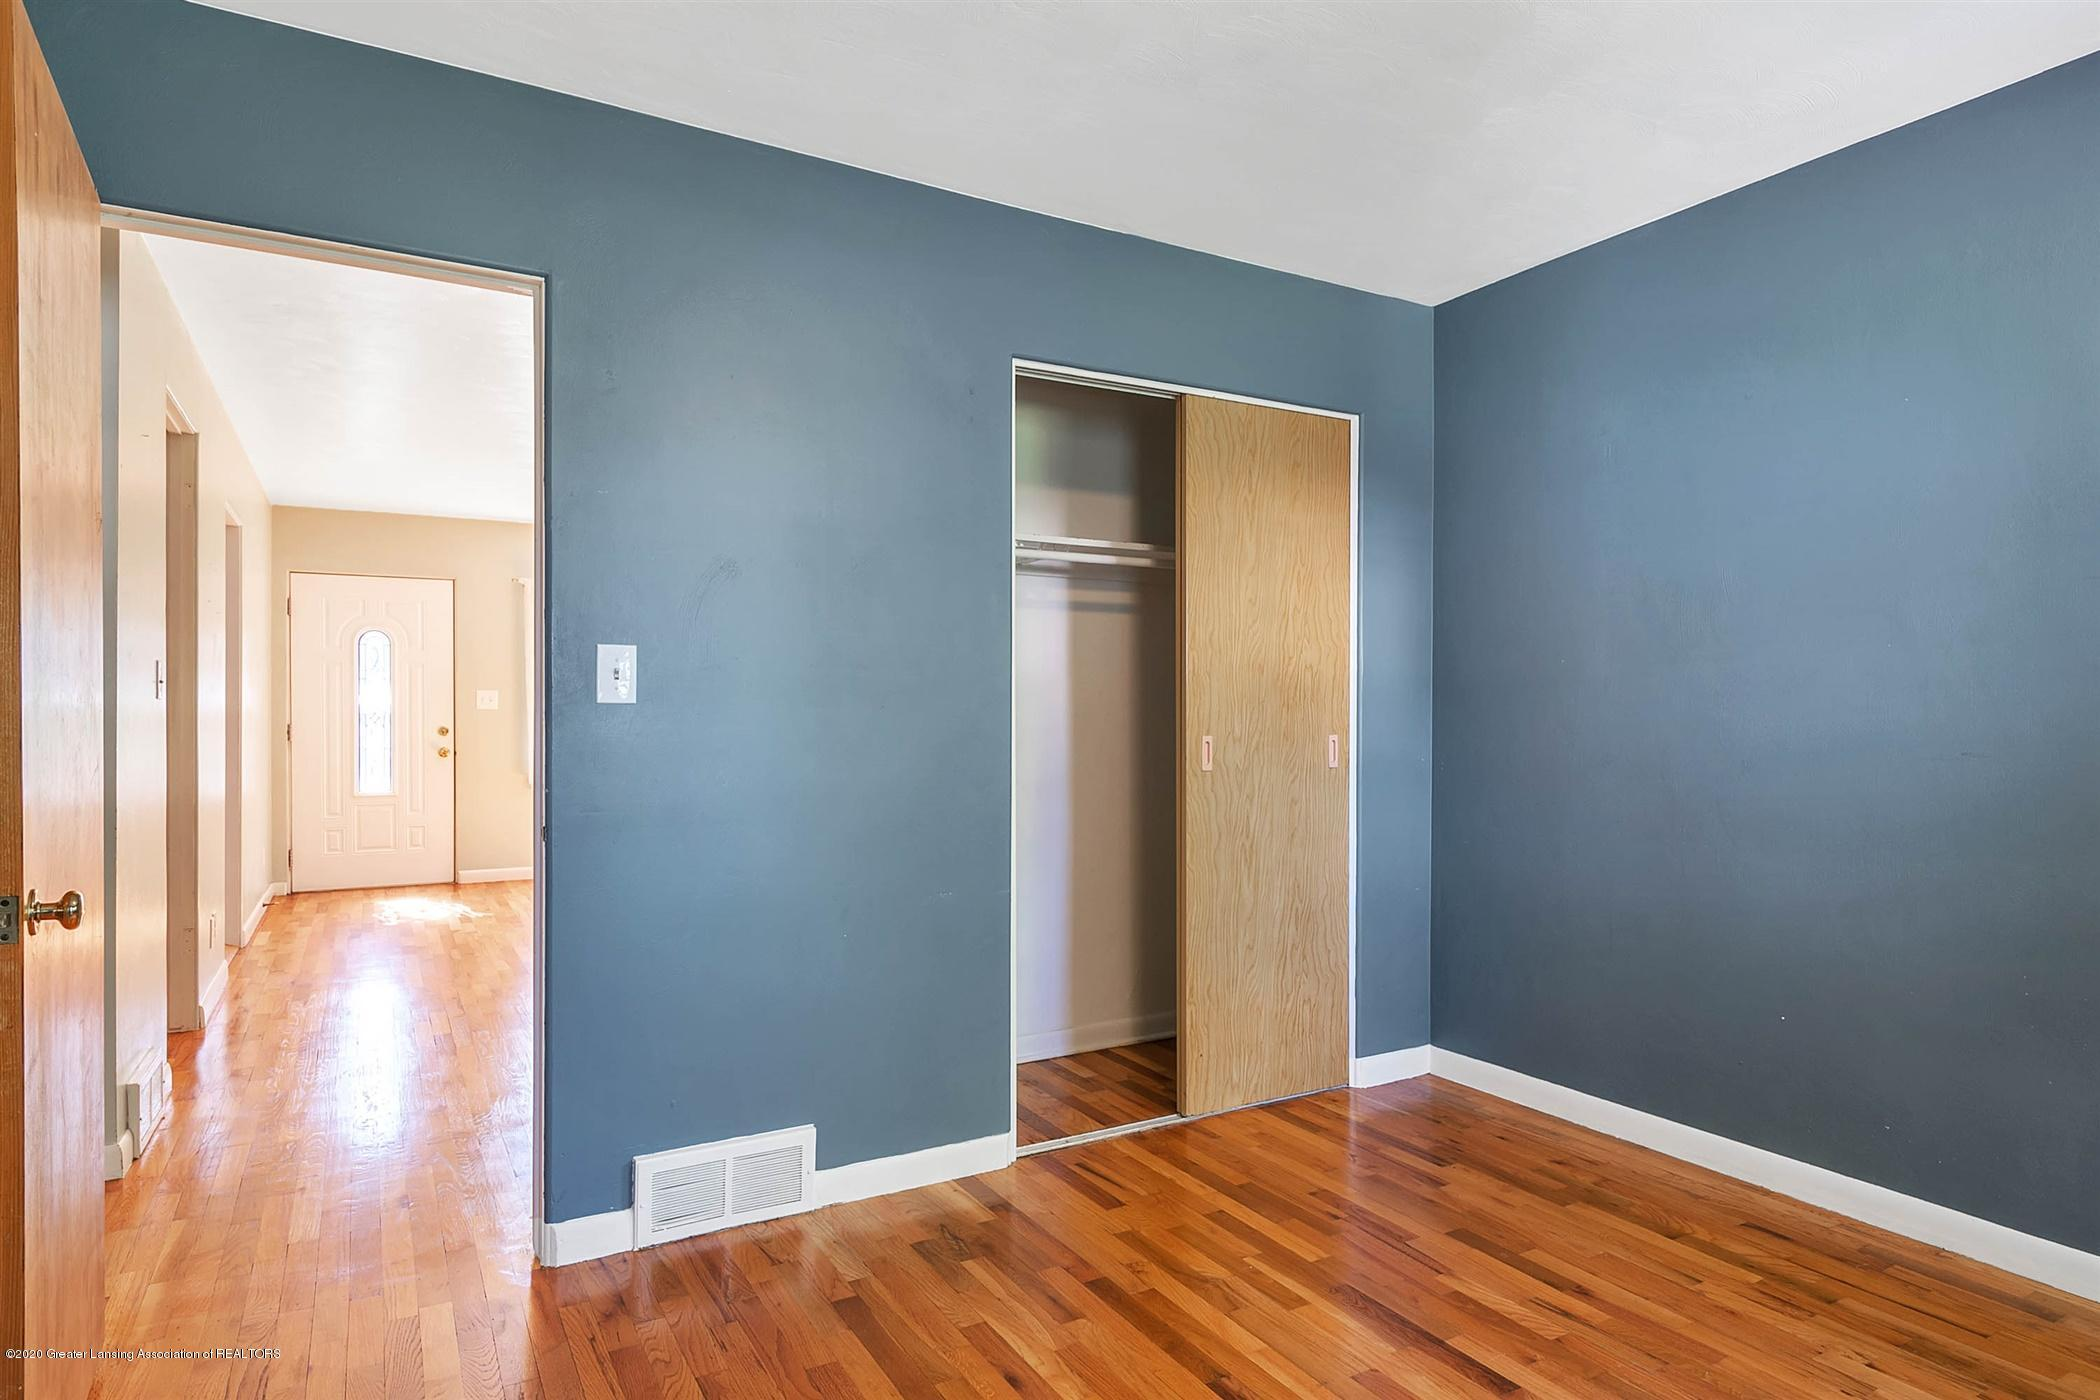 580 Lexington Ave - 15-580 Lexington Ave-WindowStill-Re - 14